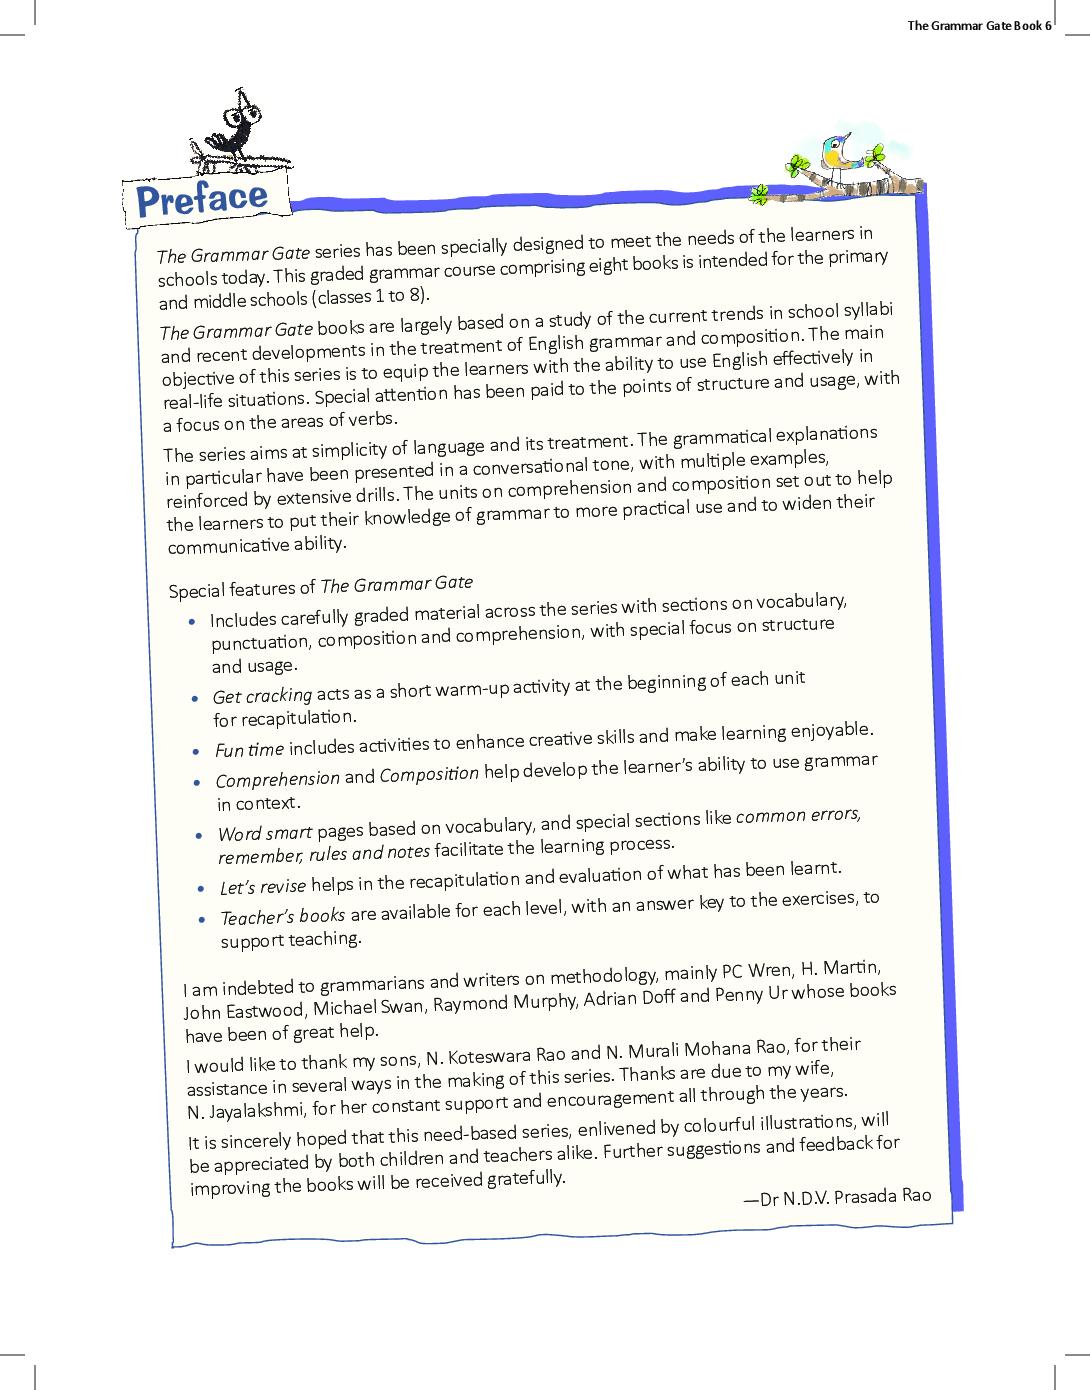 The grammar gate book 6 by dr ndv prasada rao pdf download ebook get this ebook snapshot description fandeluxe Images